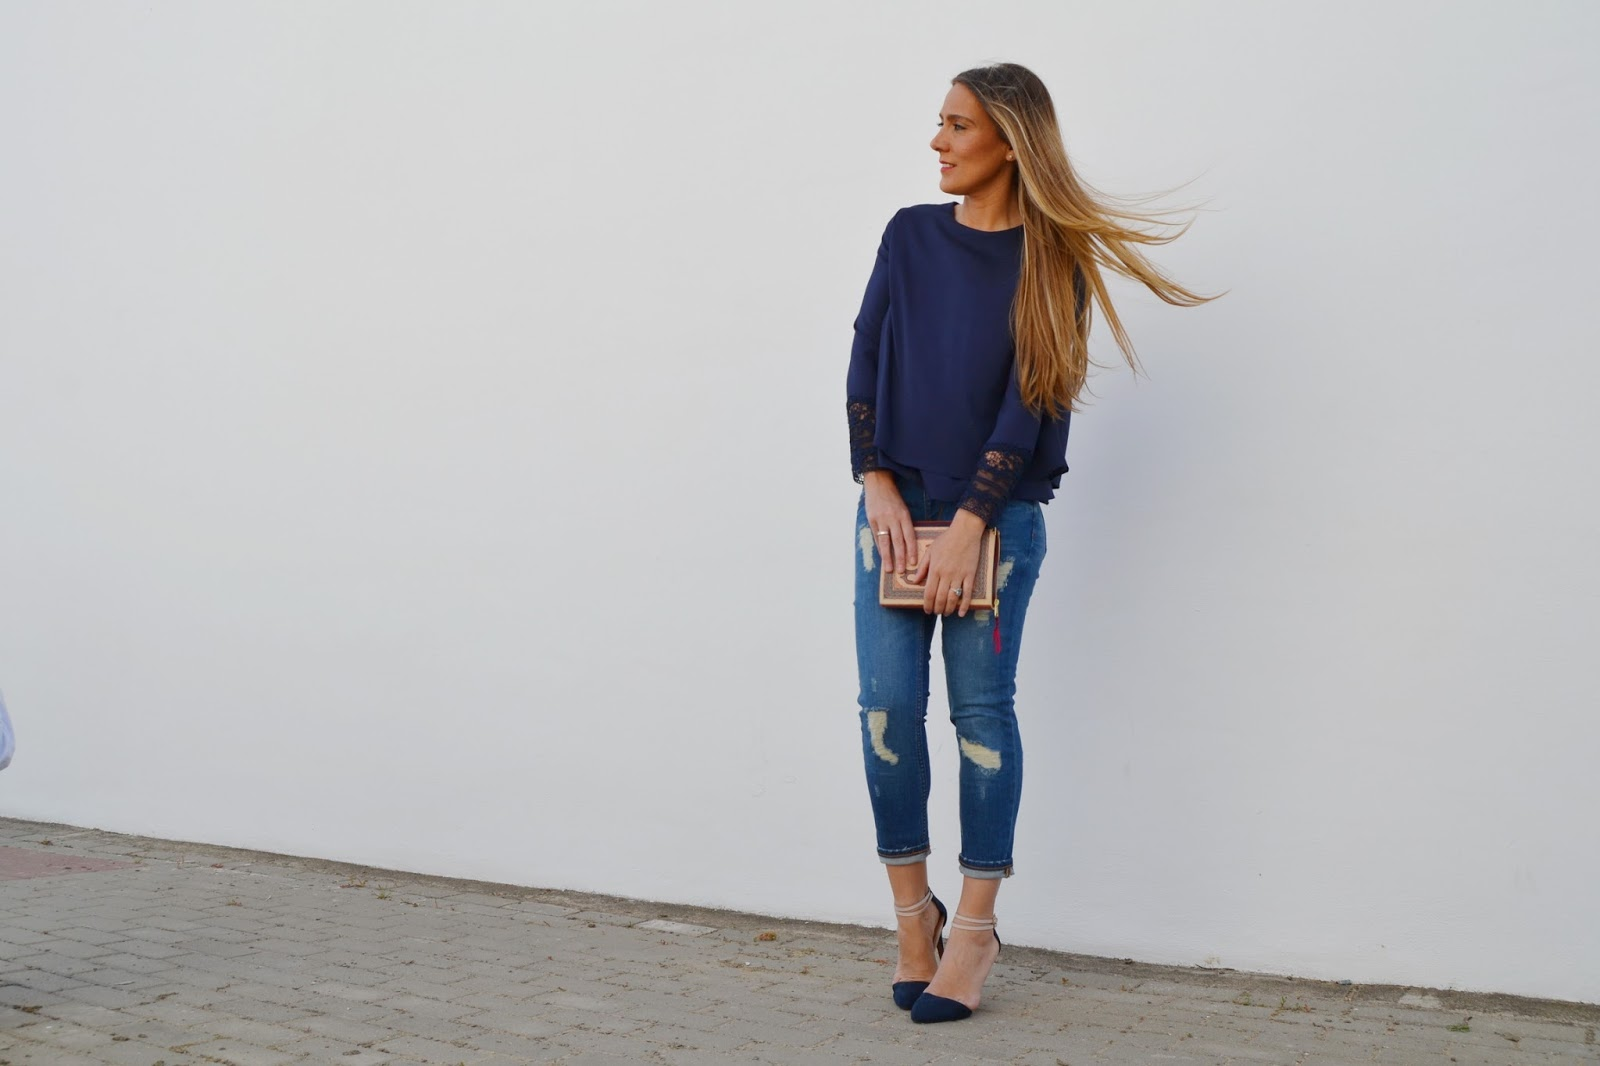 fantastic outfit tacones azul marino o